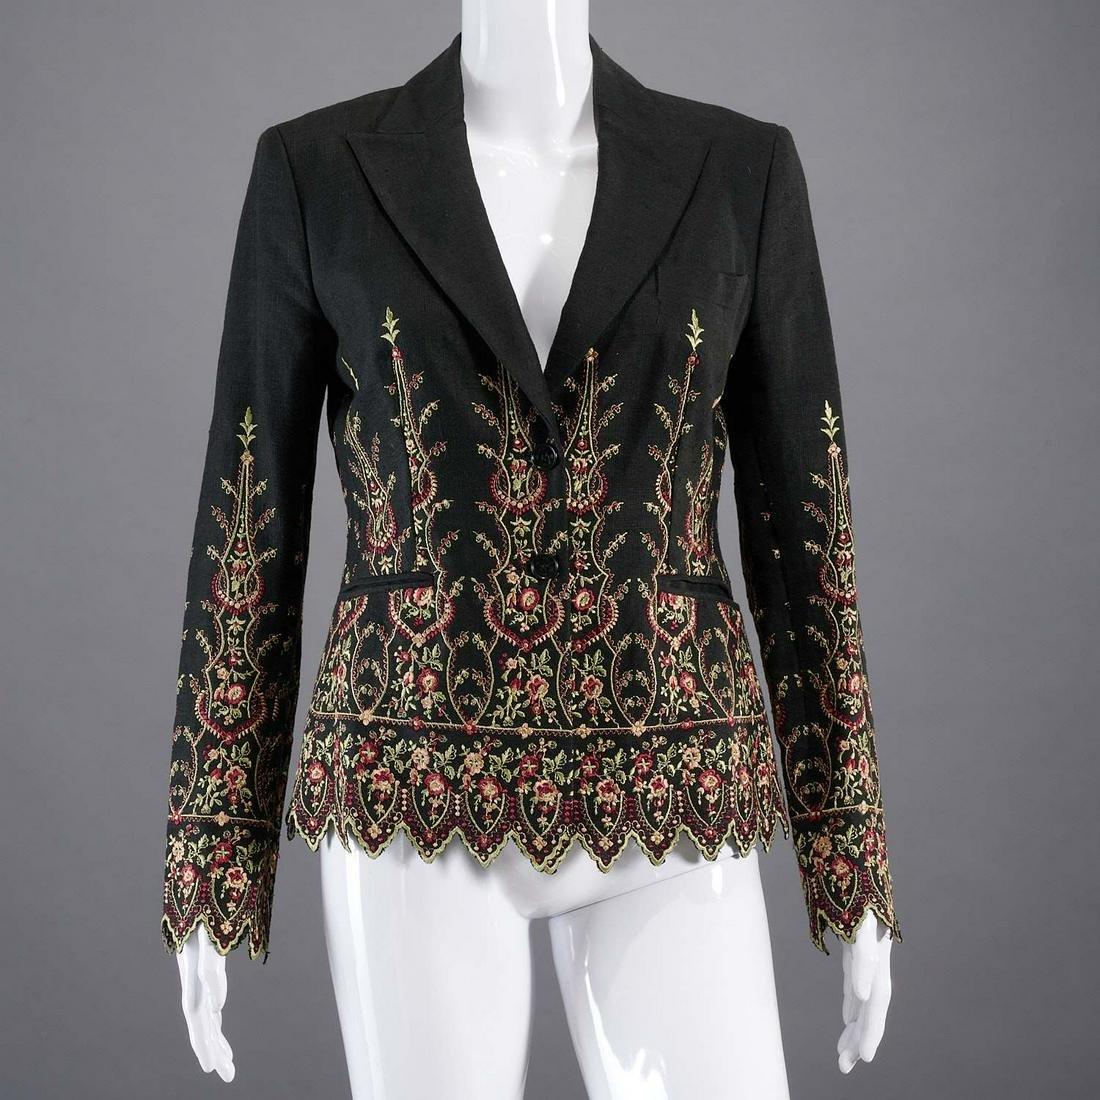 Etro Milano embroidered jacket